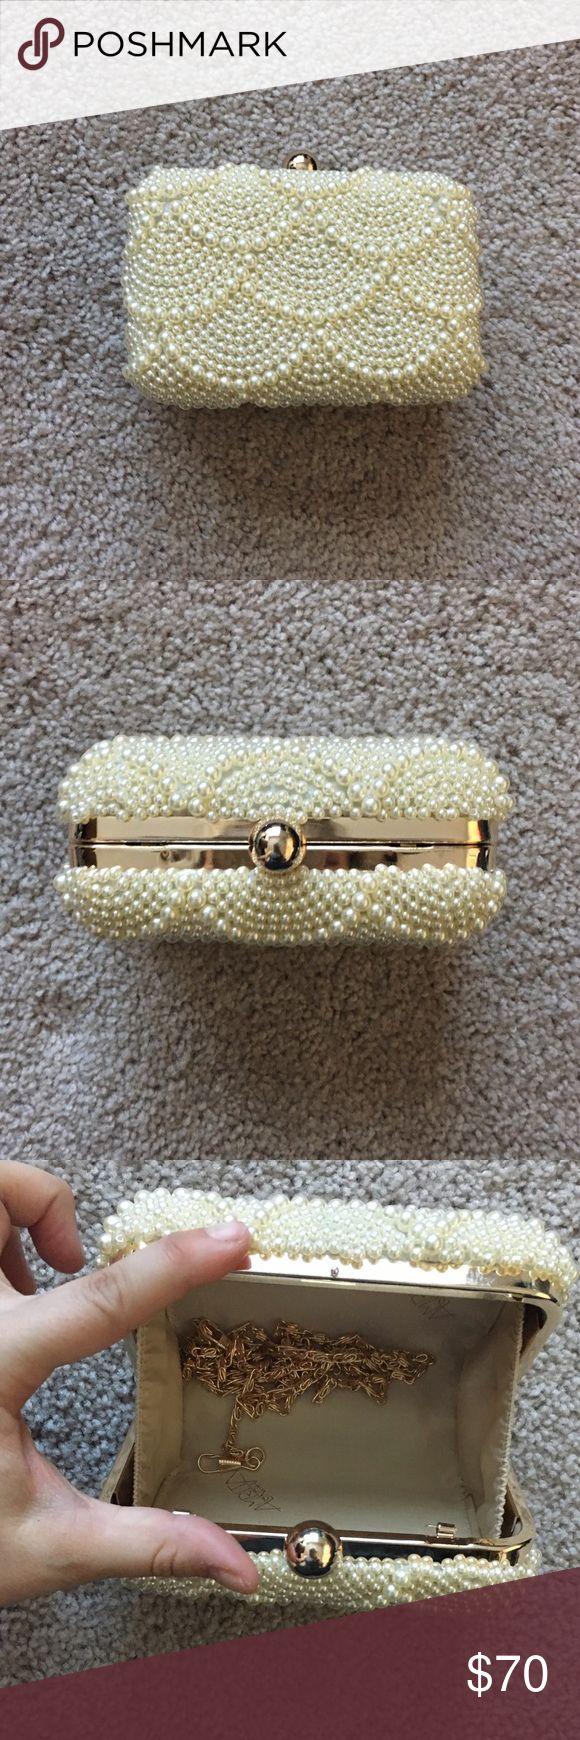 Amrita Singh Pearl-Covered Clutch Amrita Singh pearl-covered clutch with gold attachable chain. NWOT Amrita Singh Bags Clutches & Wristlets